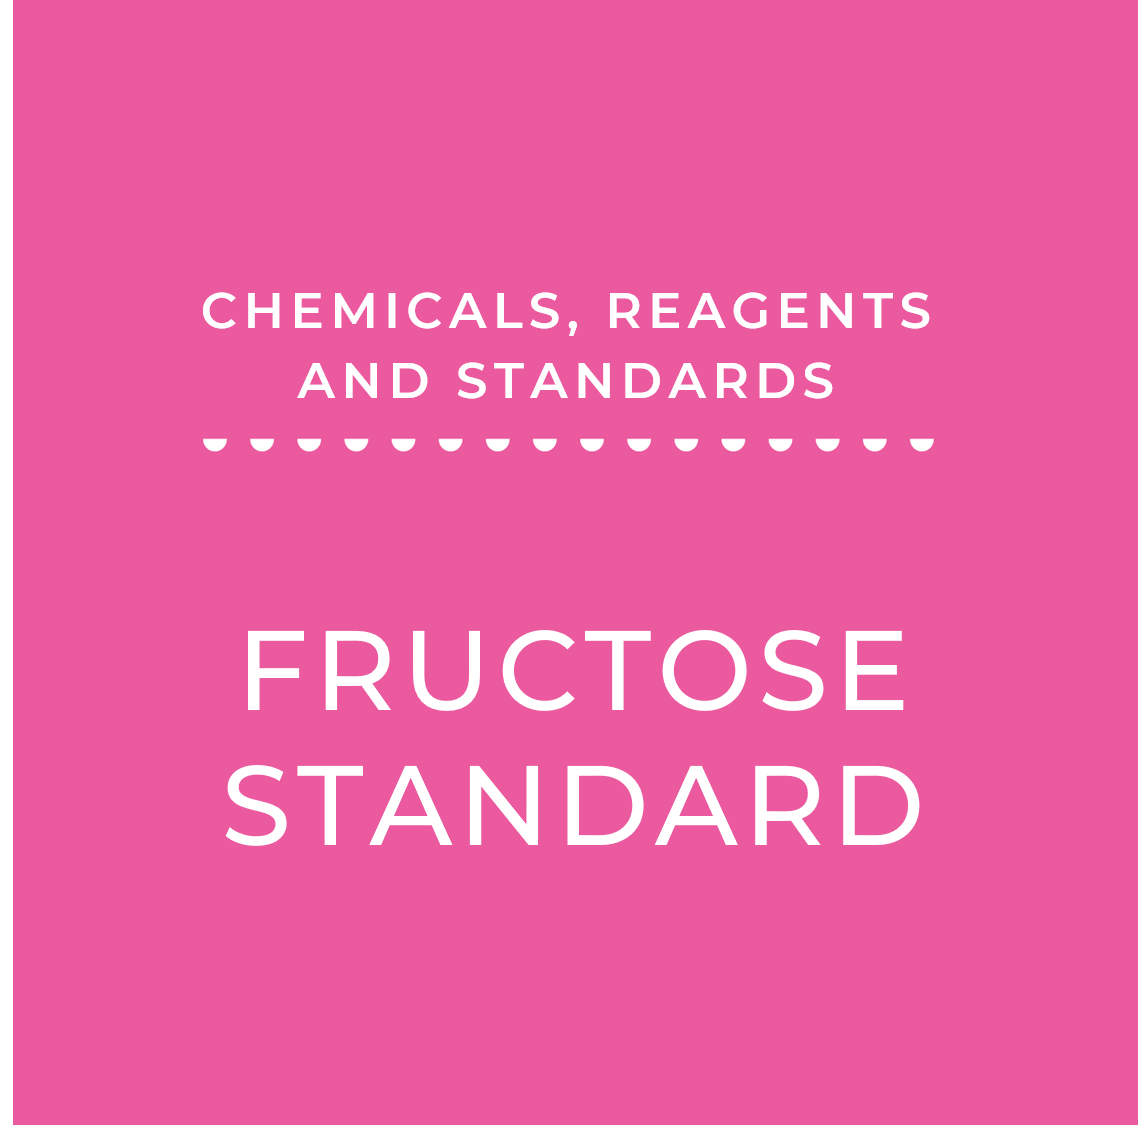 Fructose Standard